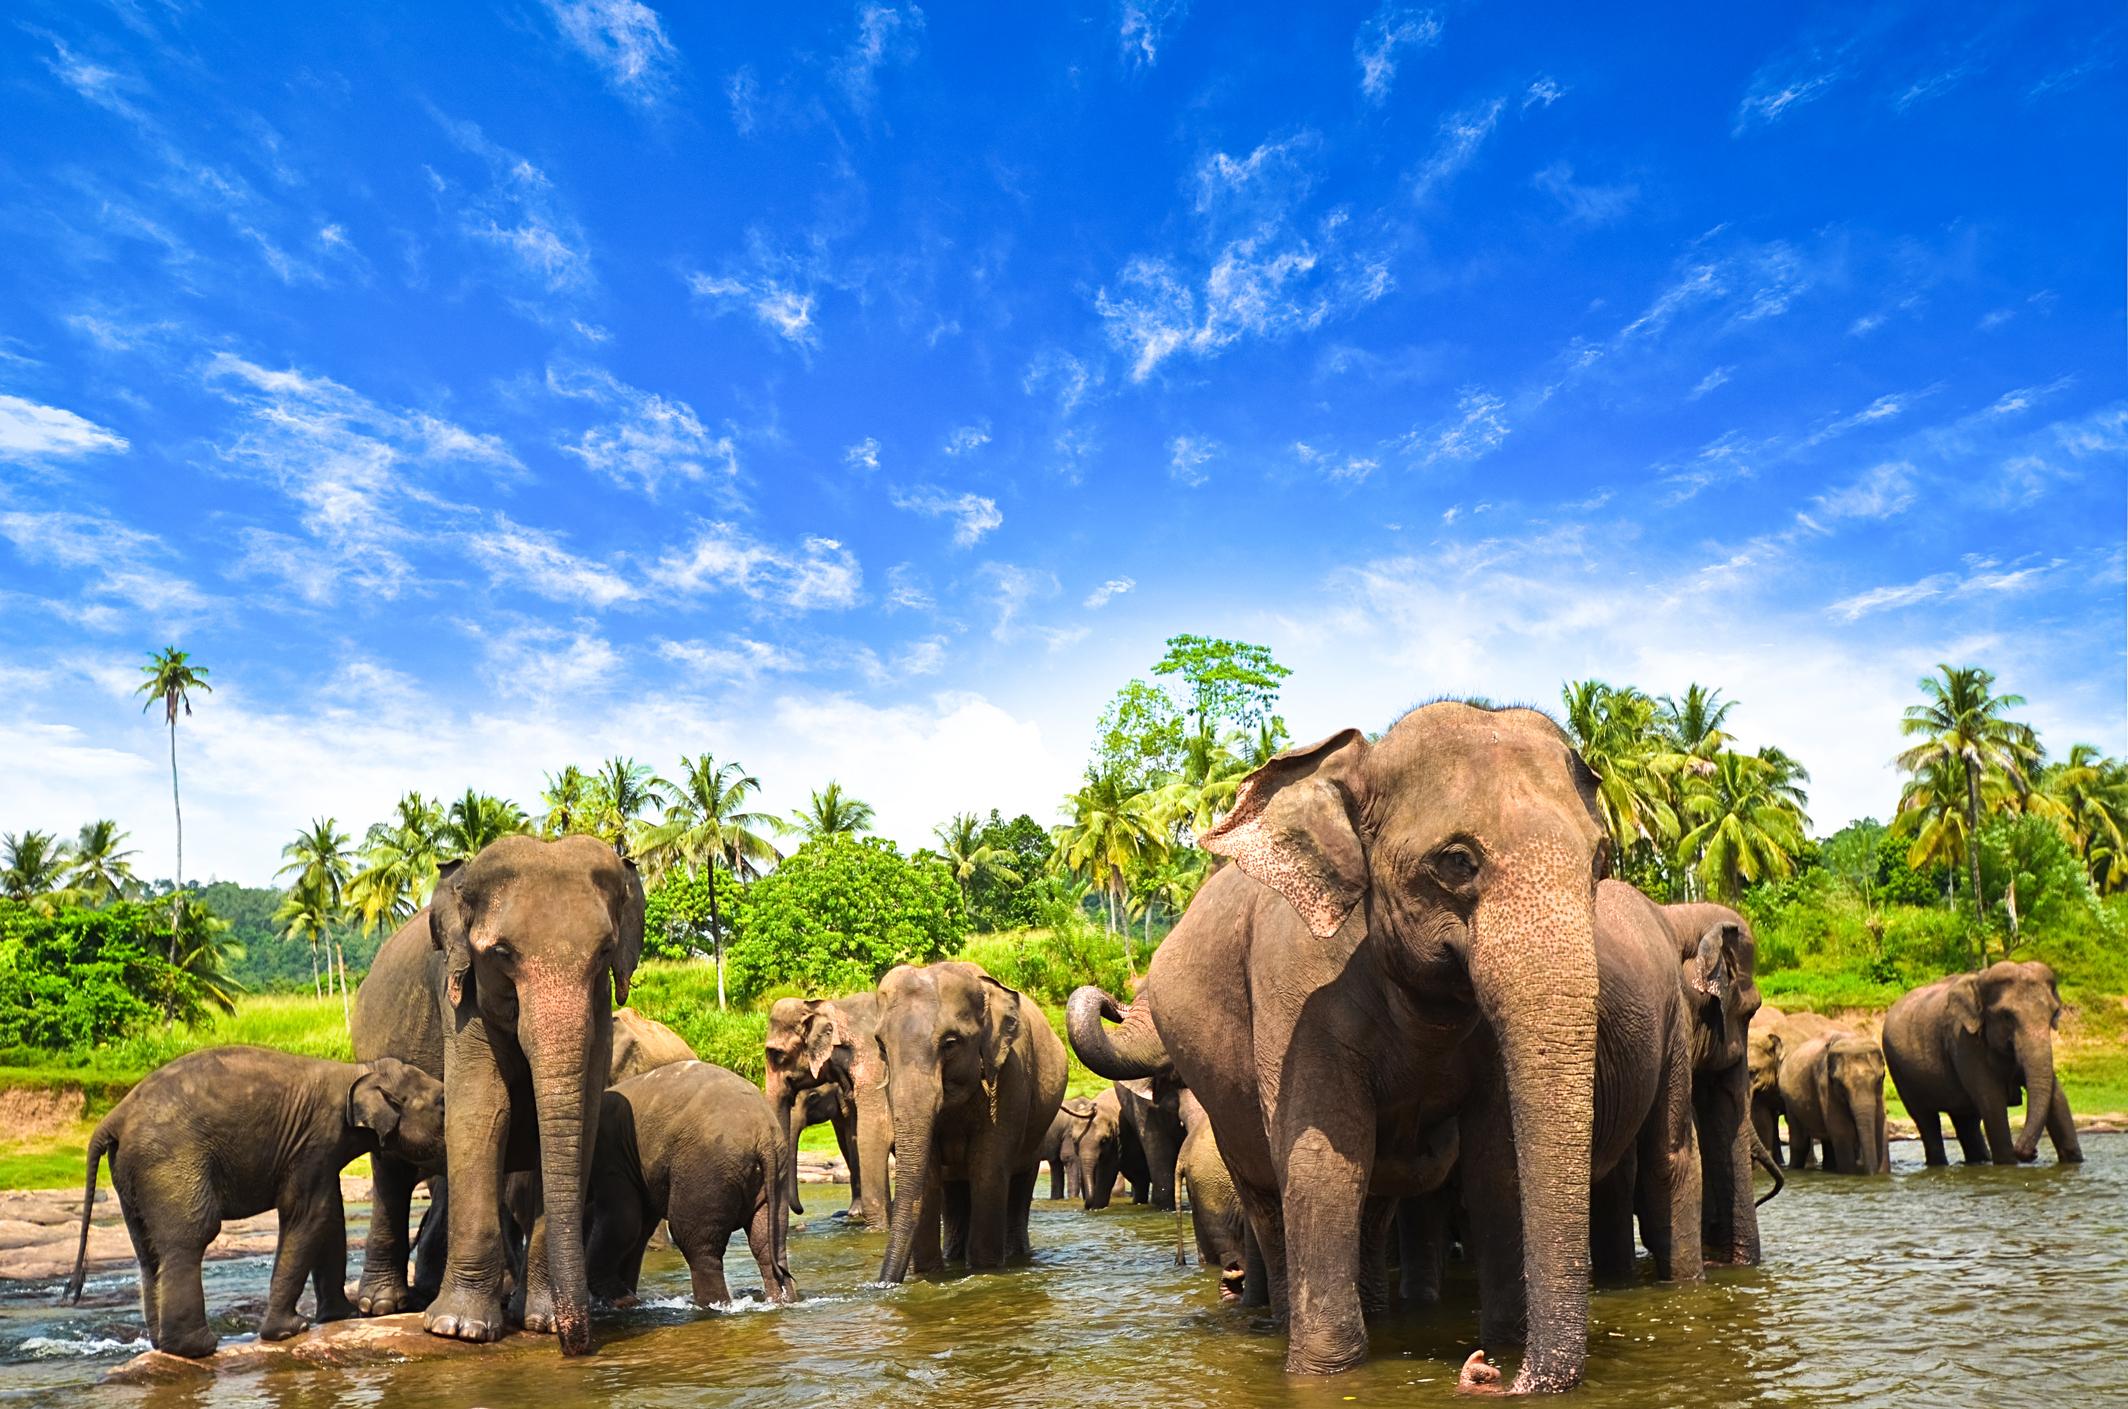 Elephants in the beautiful landscape of Sri Lanka (Getty Images)